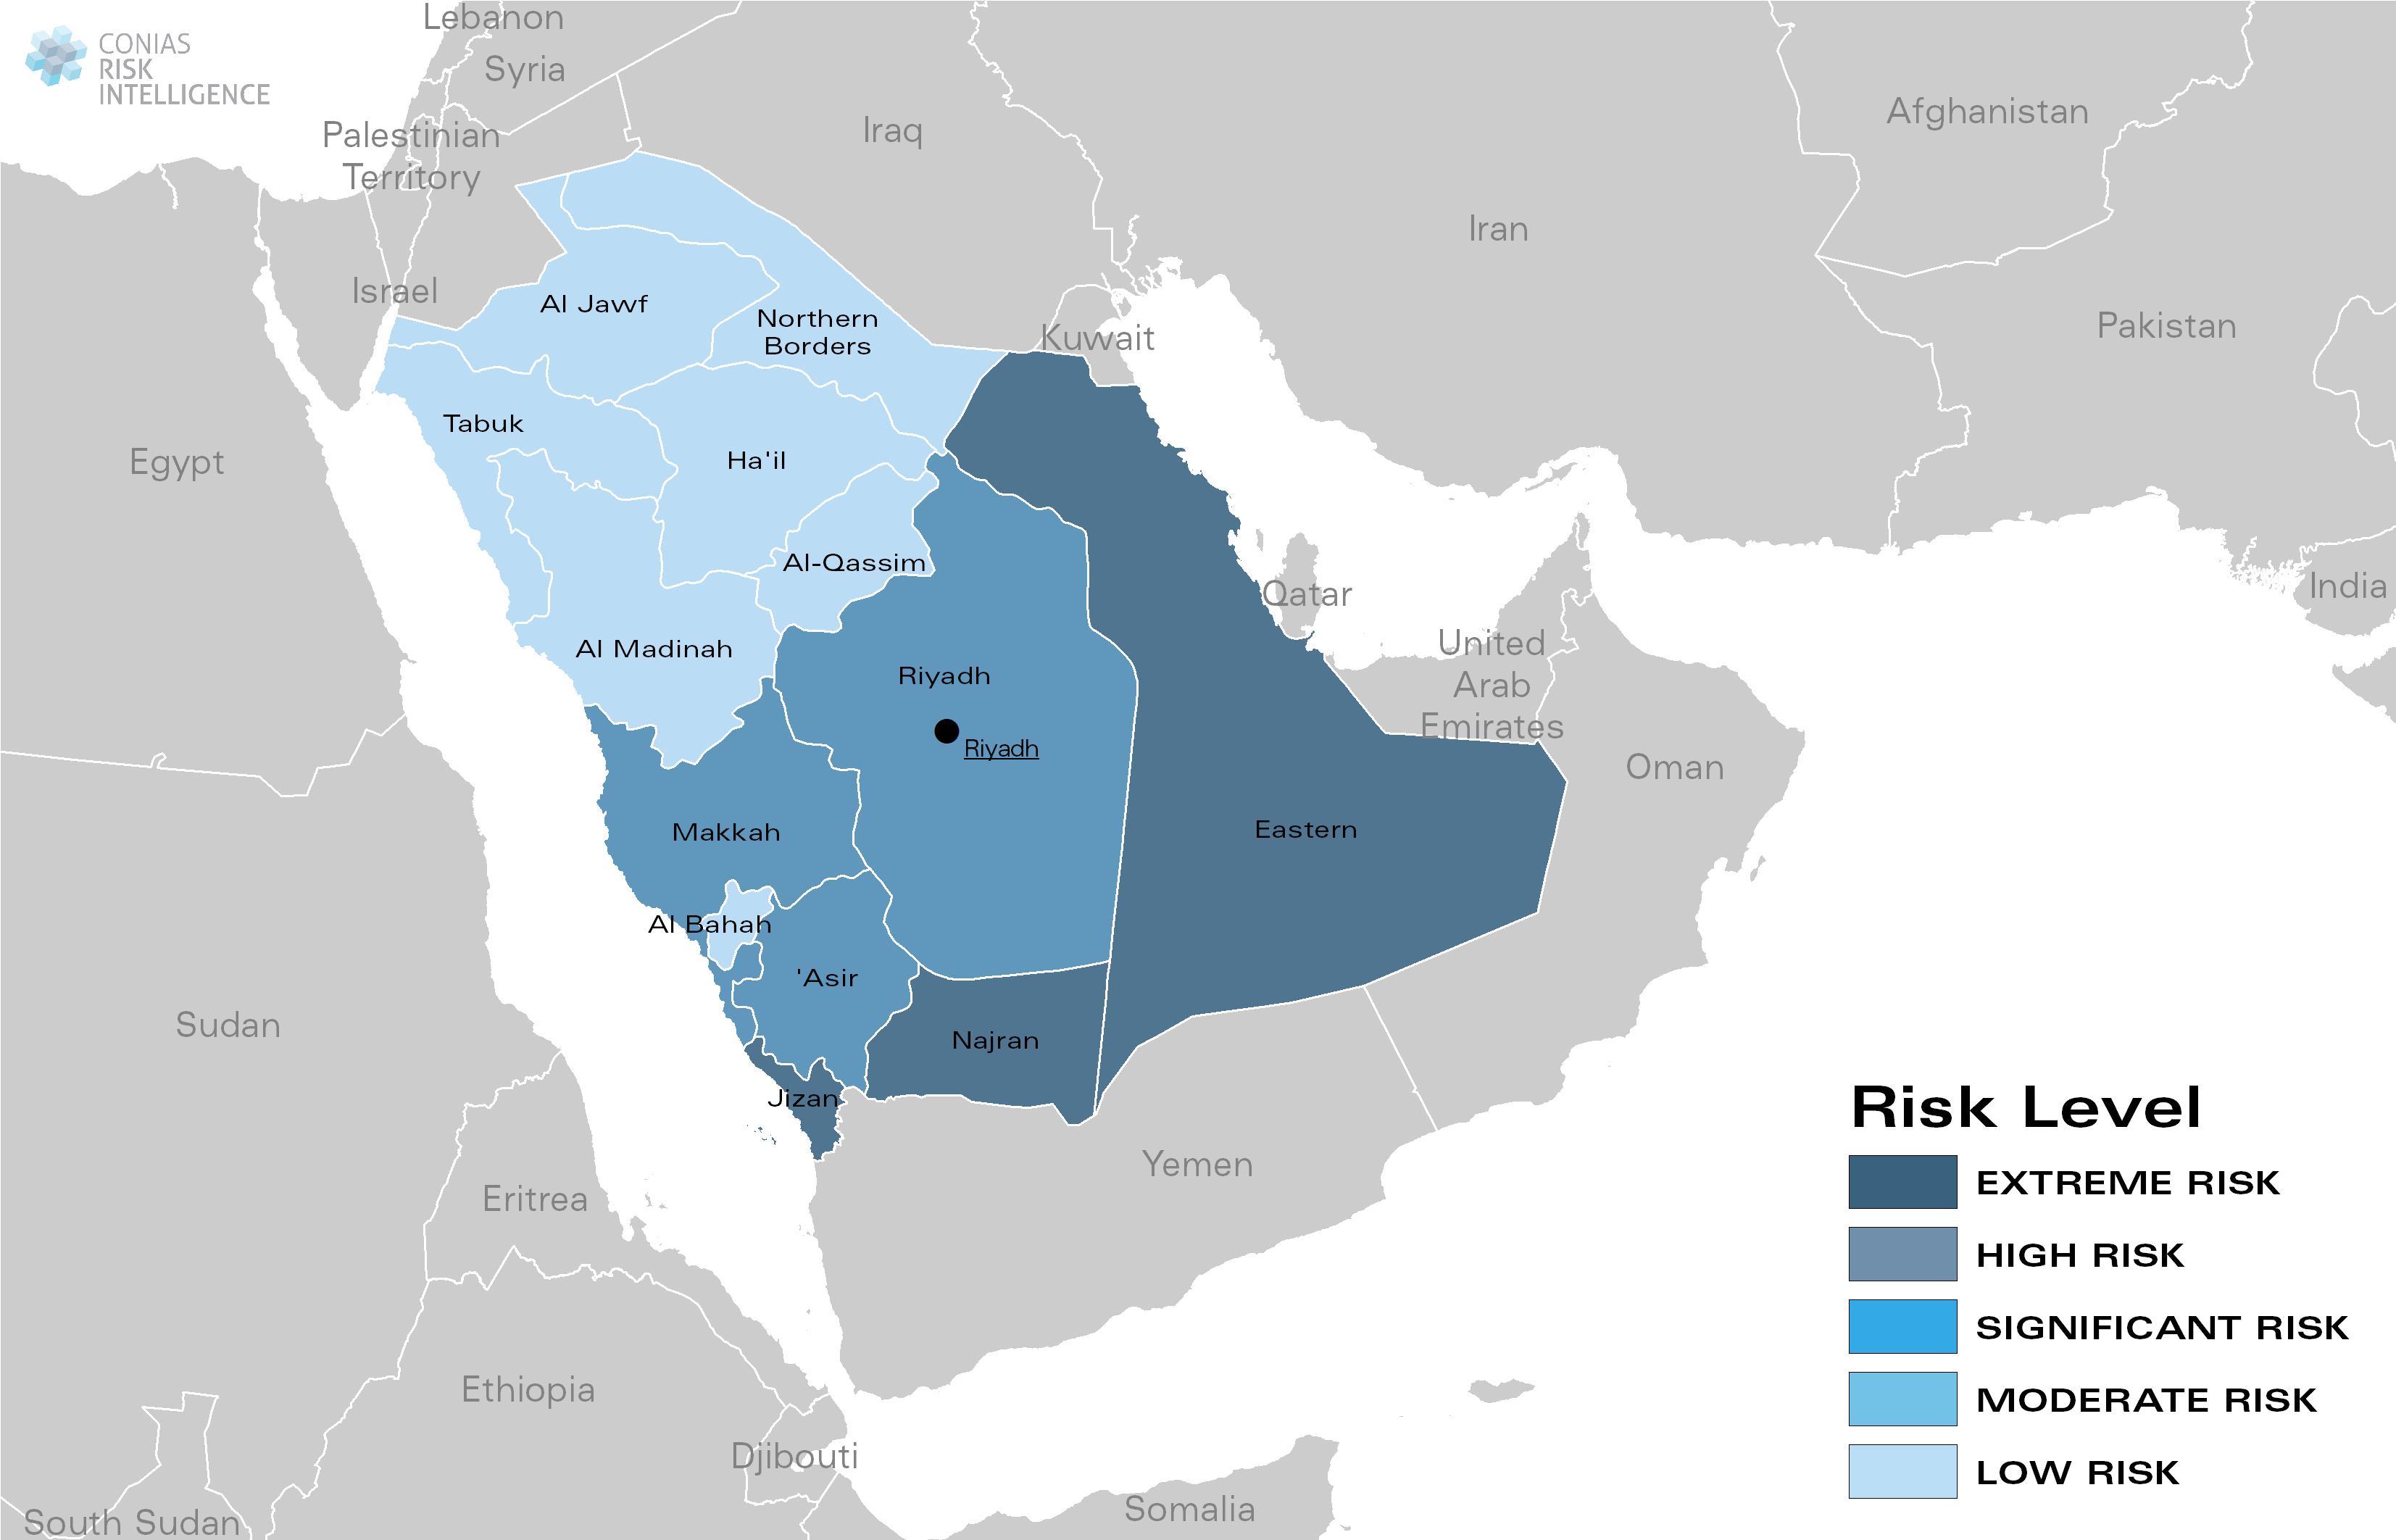 CONIAS Political Risk Maps Saudi-Arabien